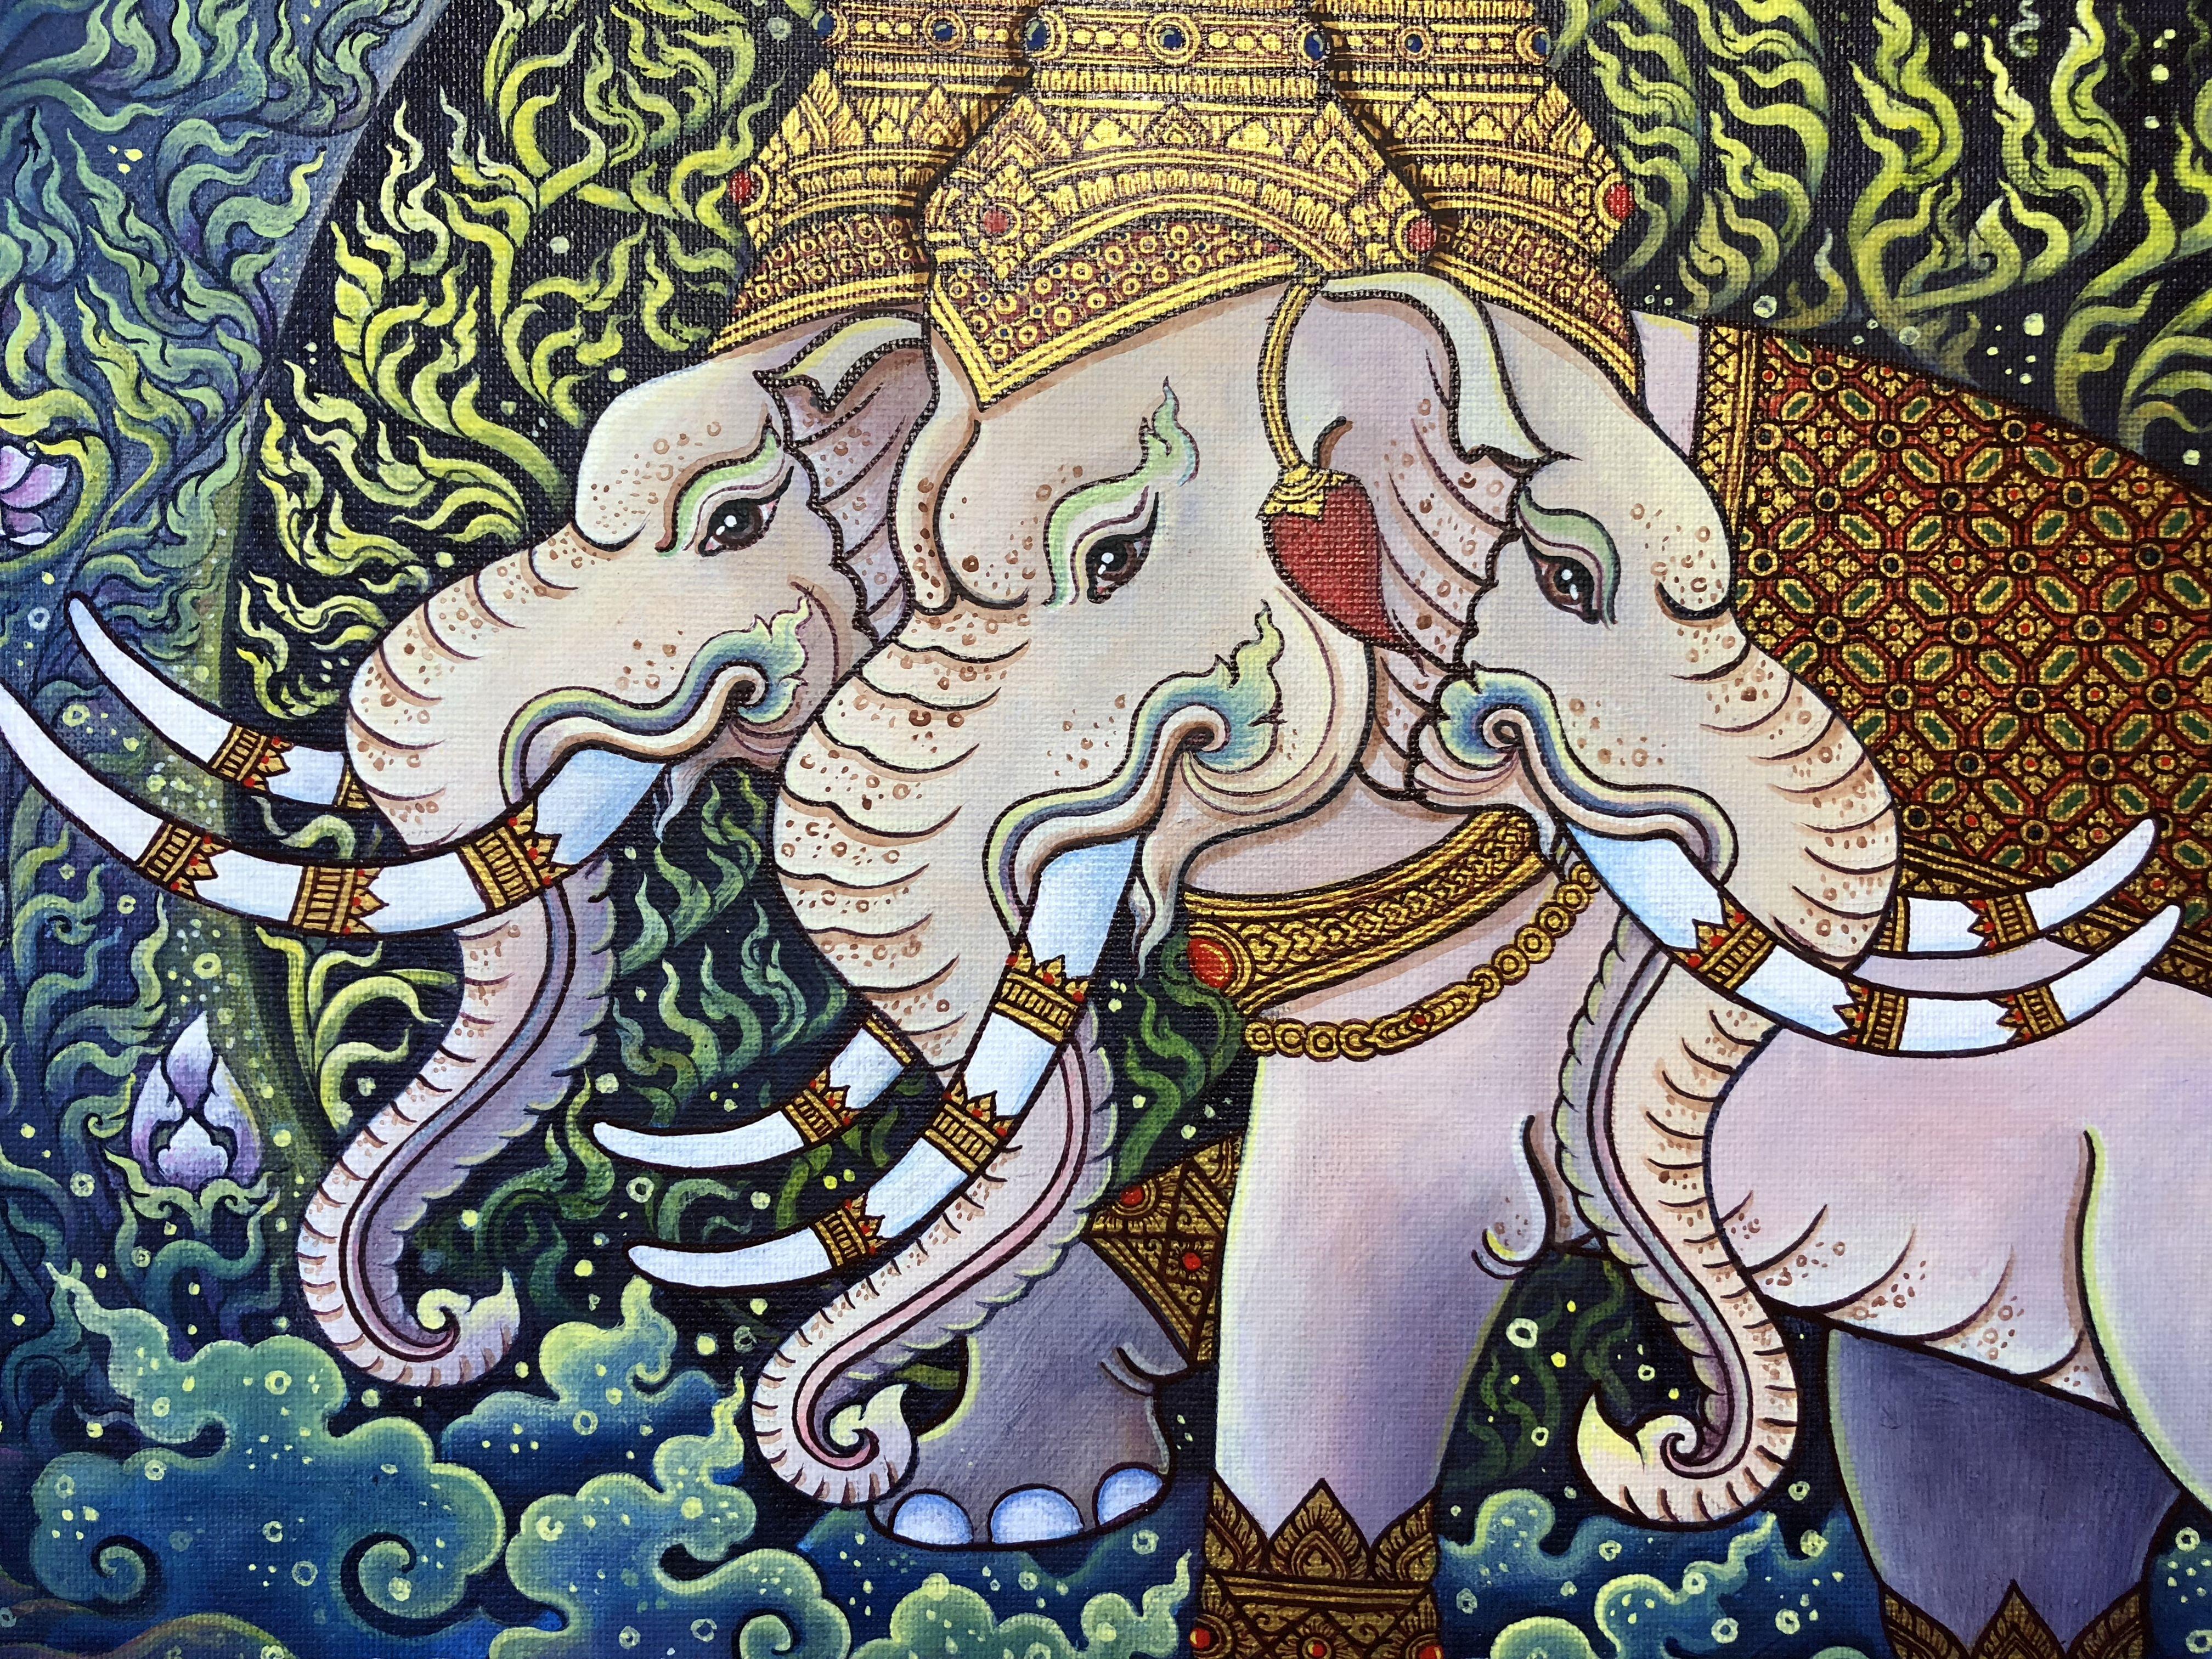 Plabpluengsgallery Thaiart Erawan Painting Acrylicpainting Loveart Artist Elephant Malerei Leinwand Kunsthandwerk ศ ล ศ ลปะไทย ศ ลปะ จ ตรกรรมฝาผน ง